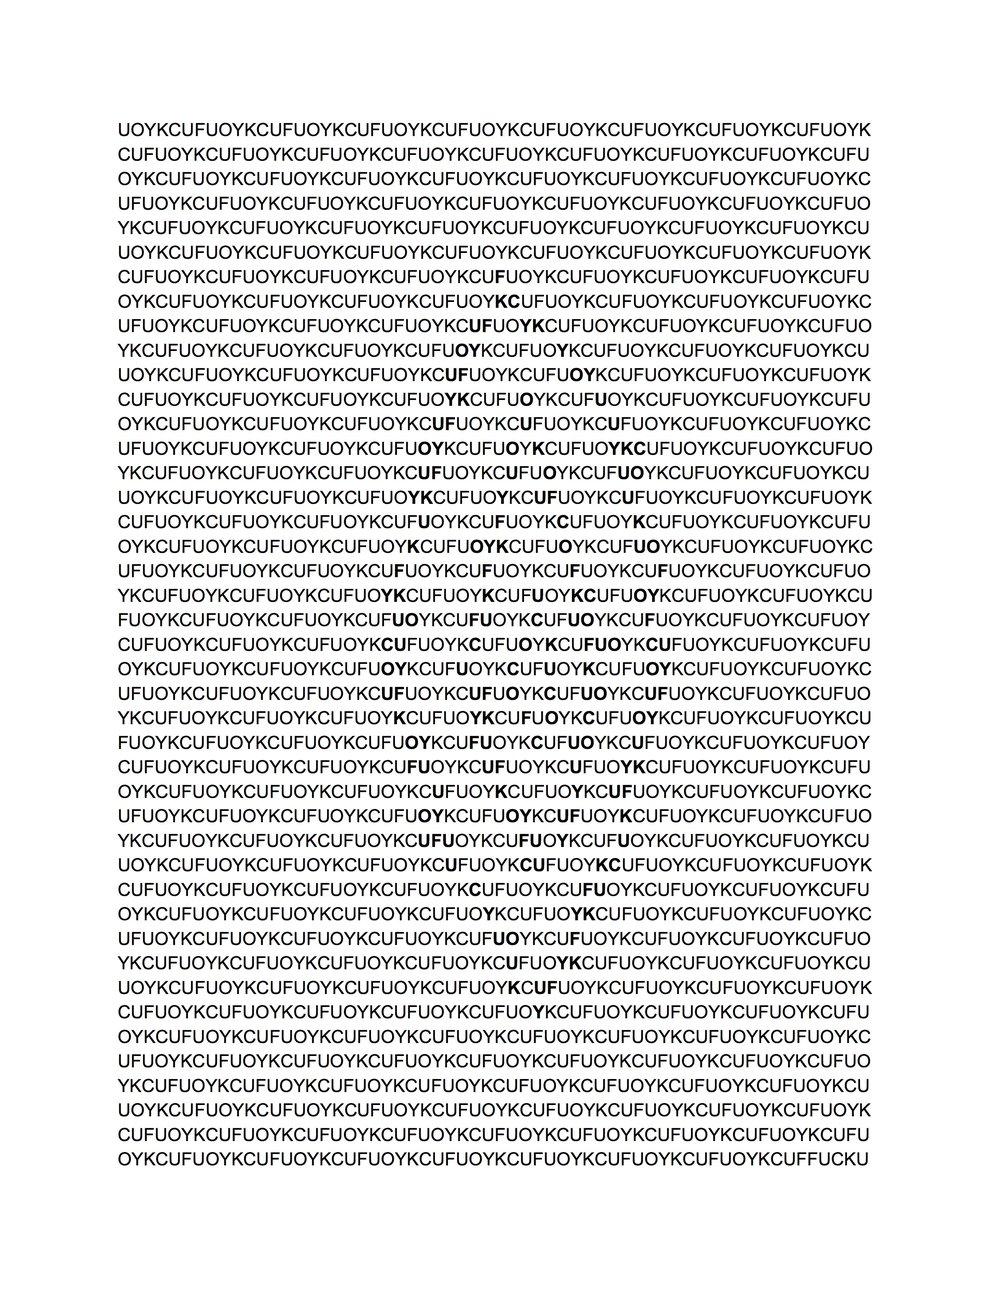 Untitleddocument (1).jpg